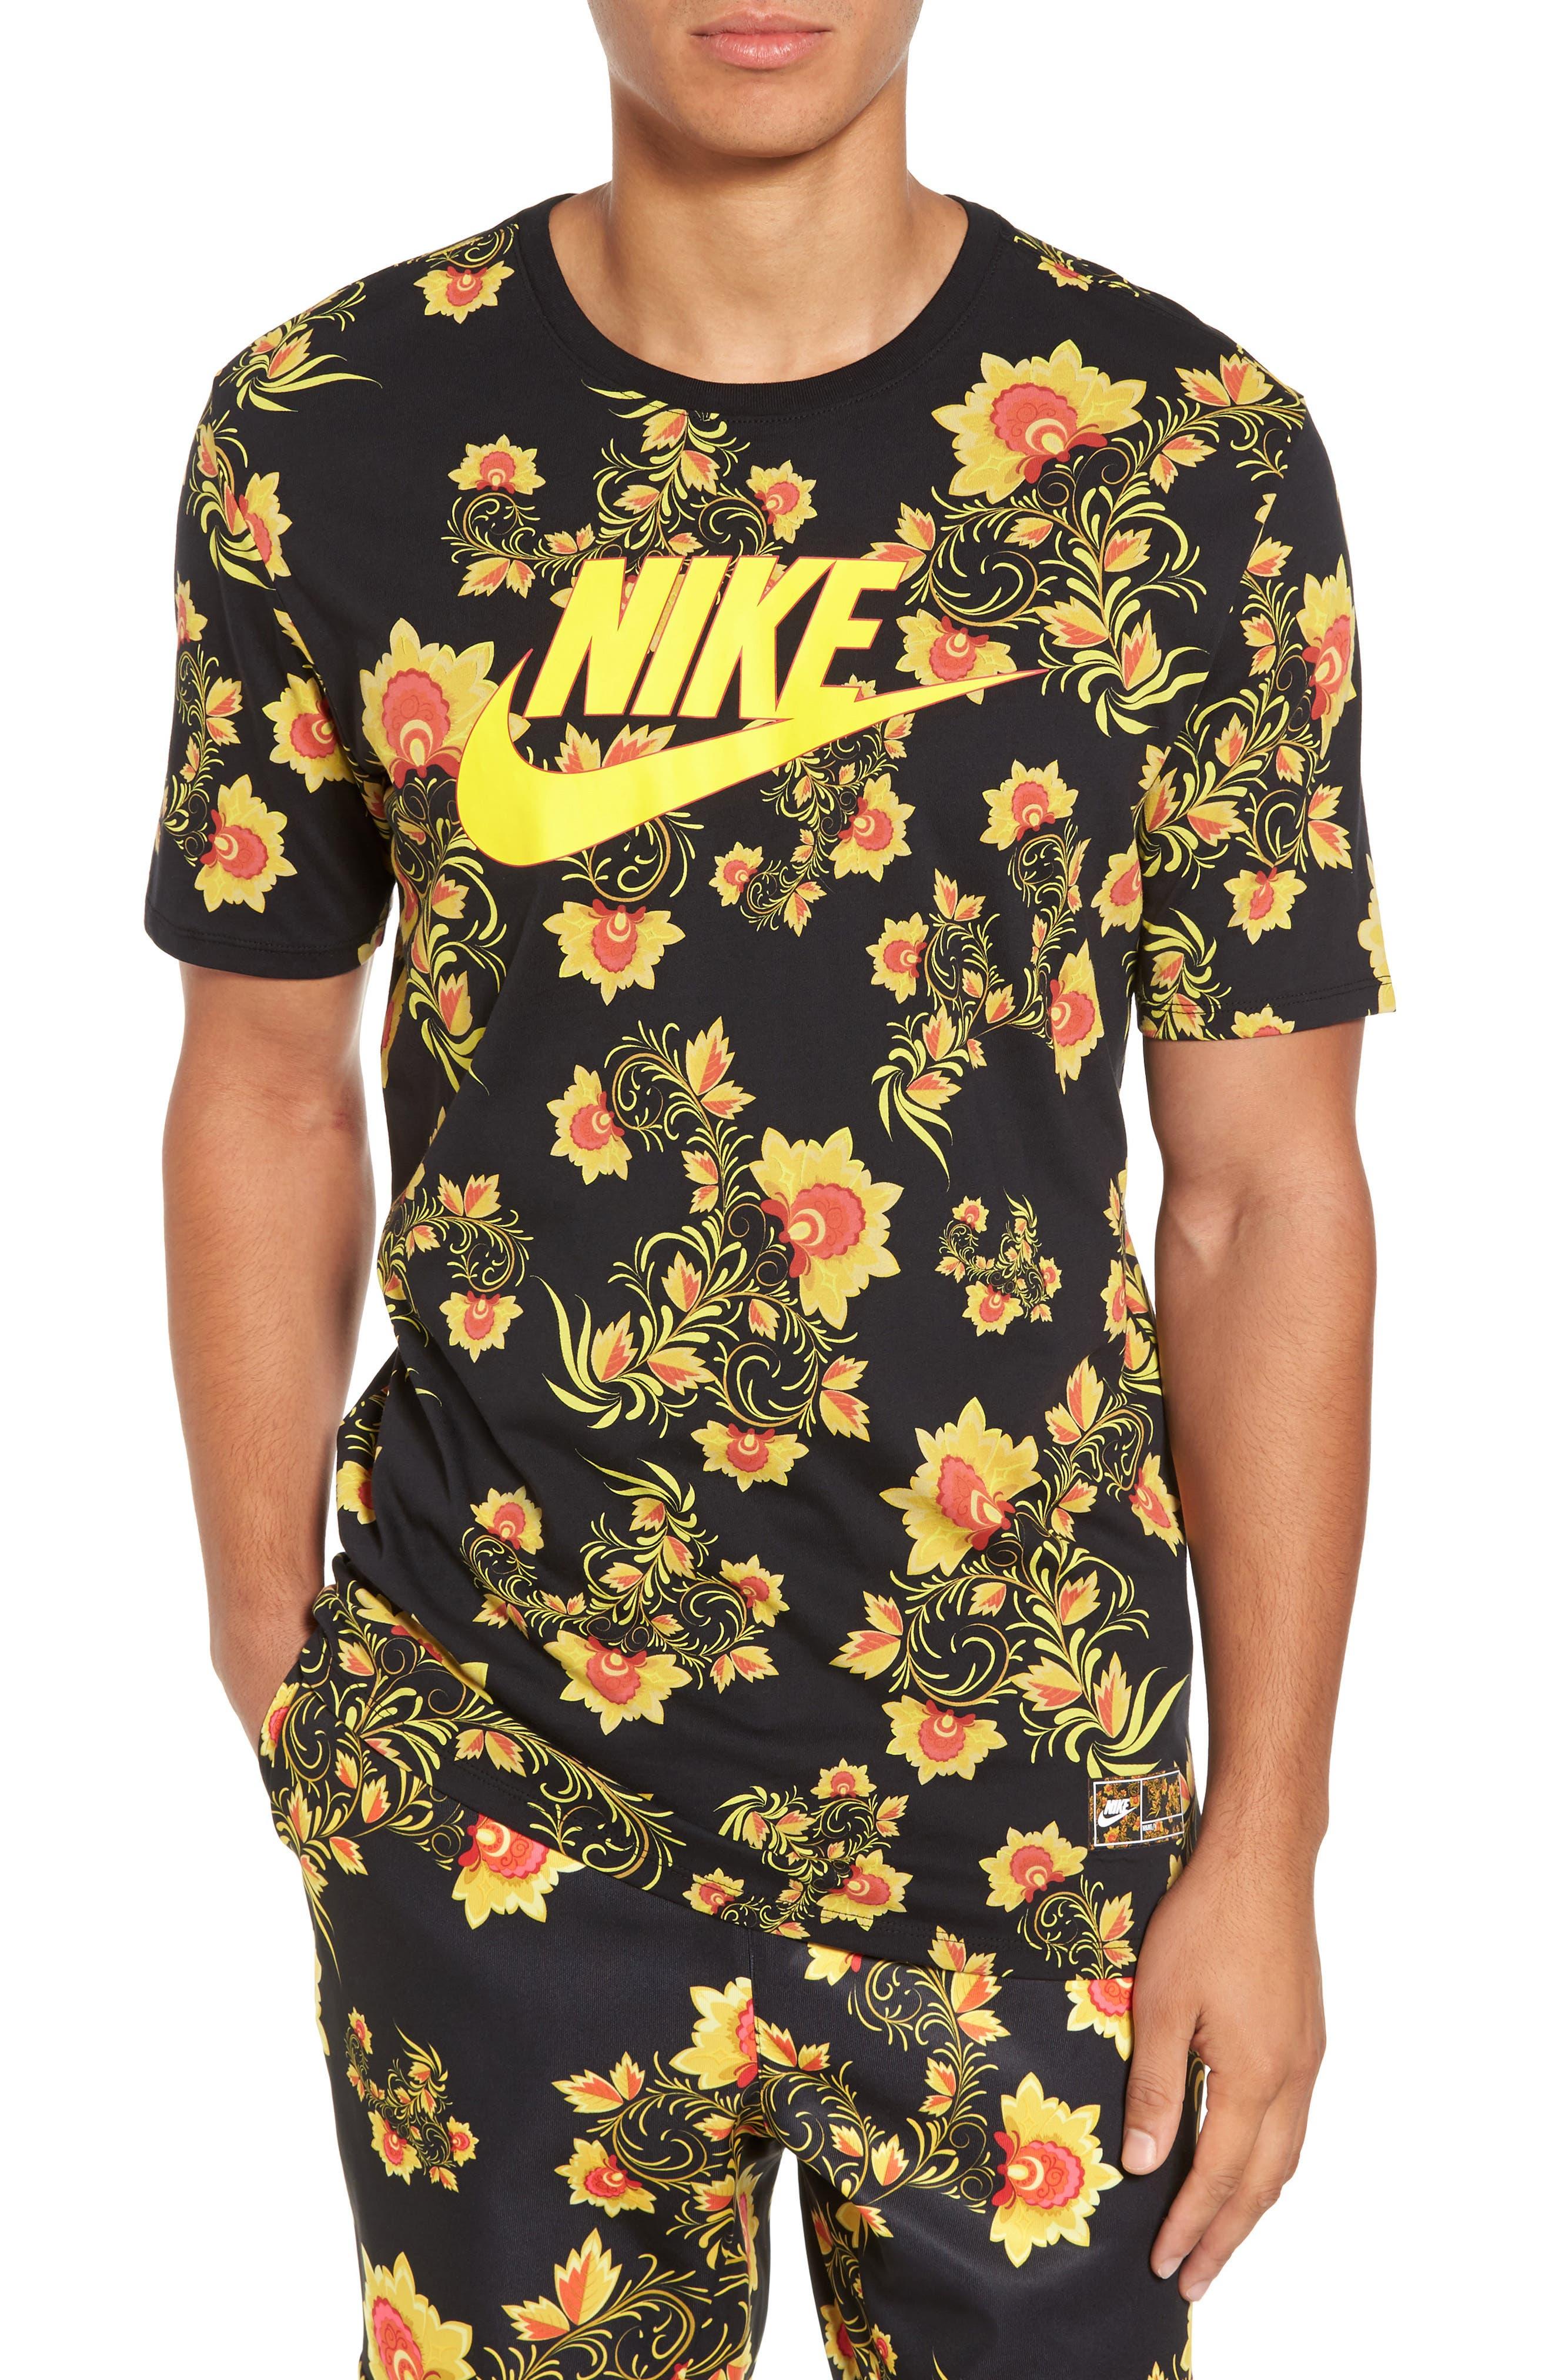 NSW Concept T-Shirt,                         Main,                         color, Black/ Tour Yellow